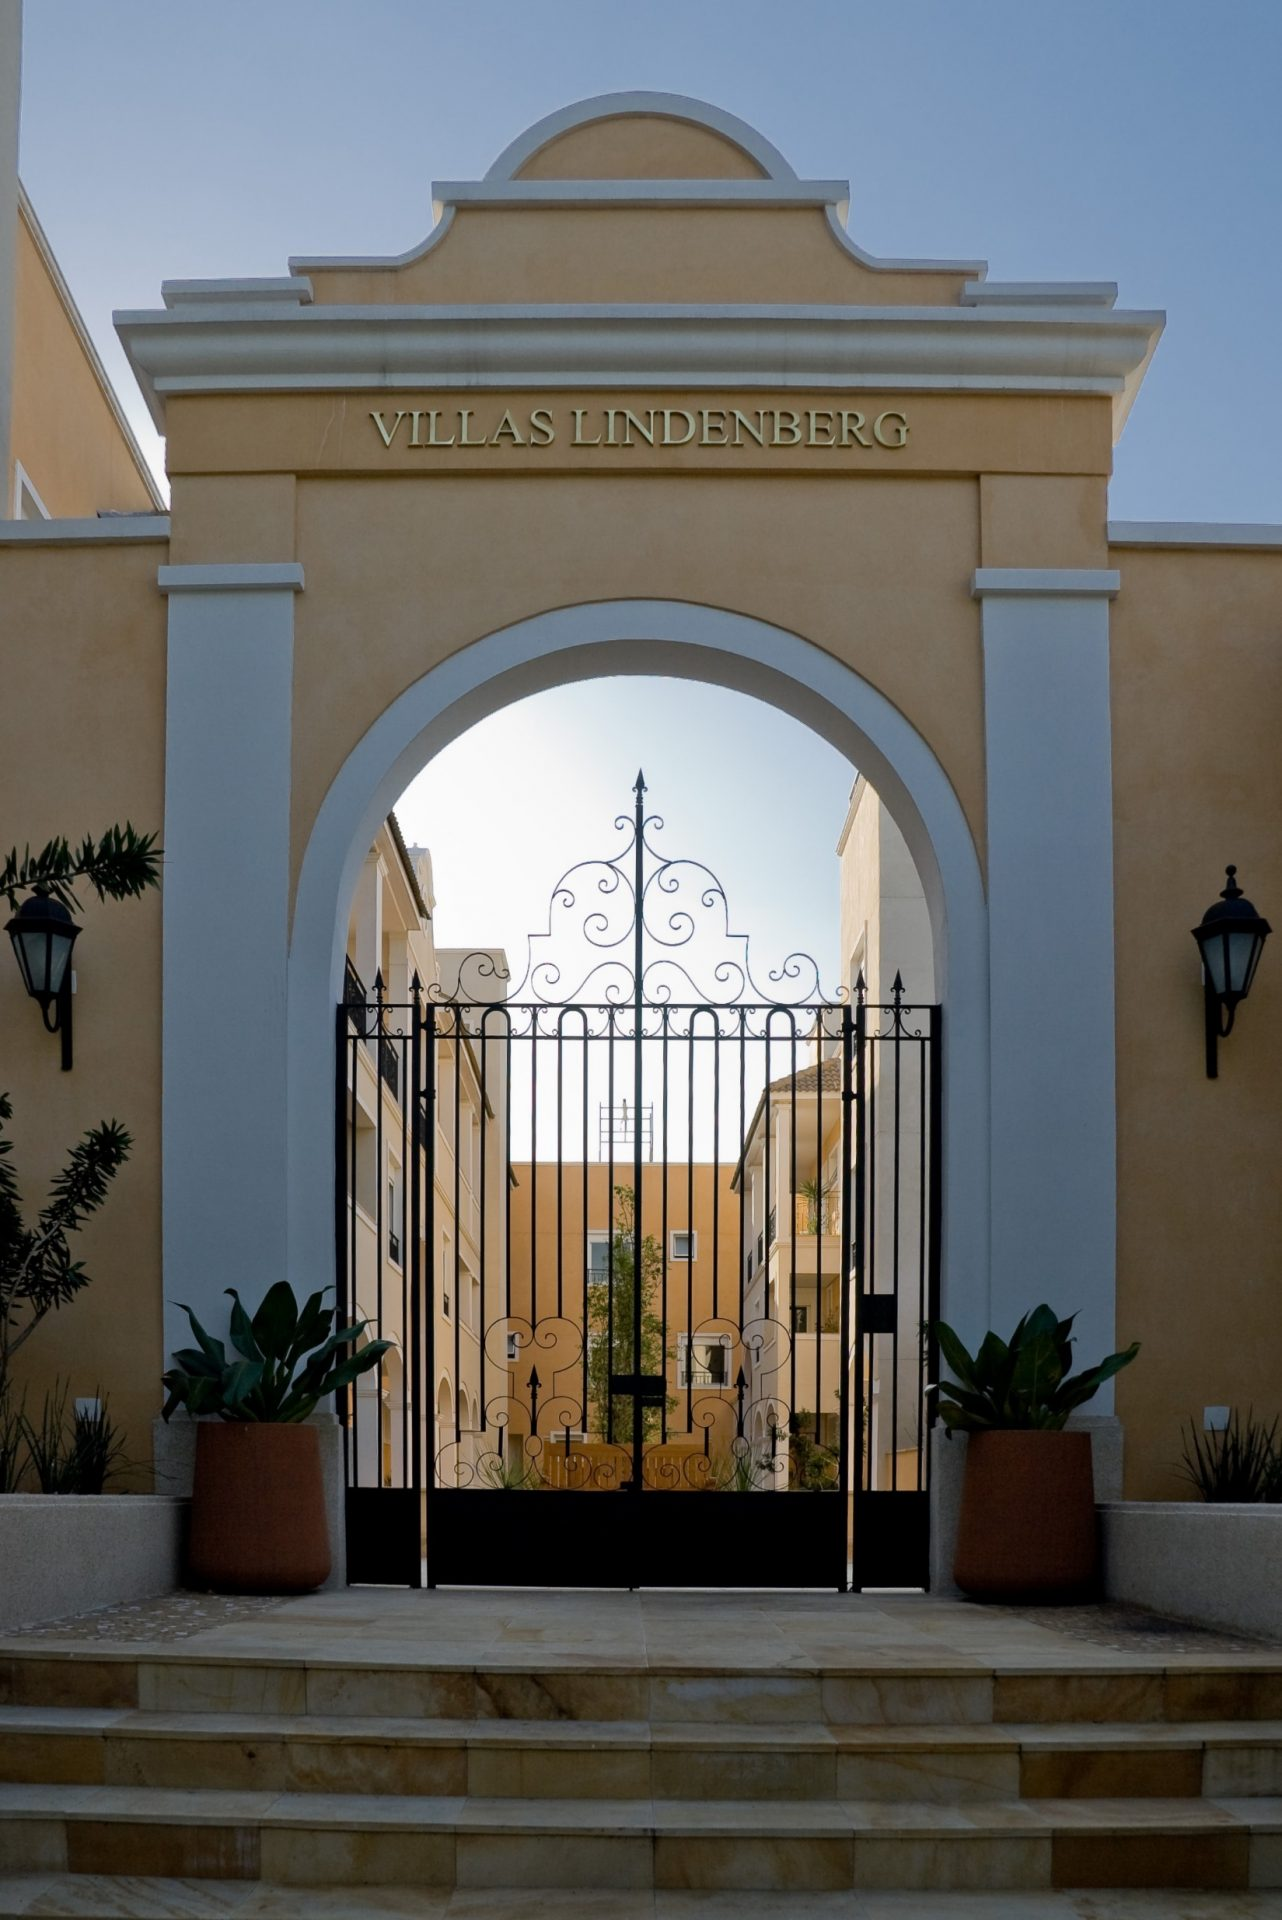 Villas Lindenberg